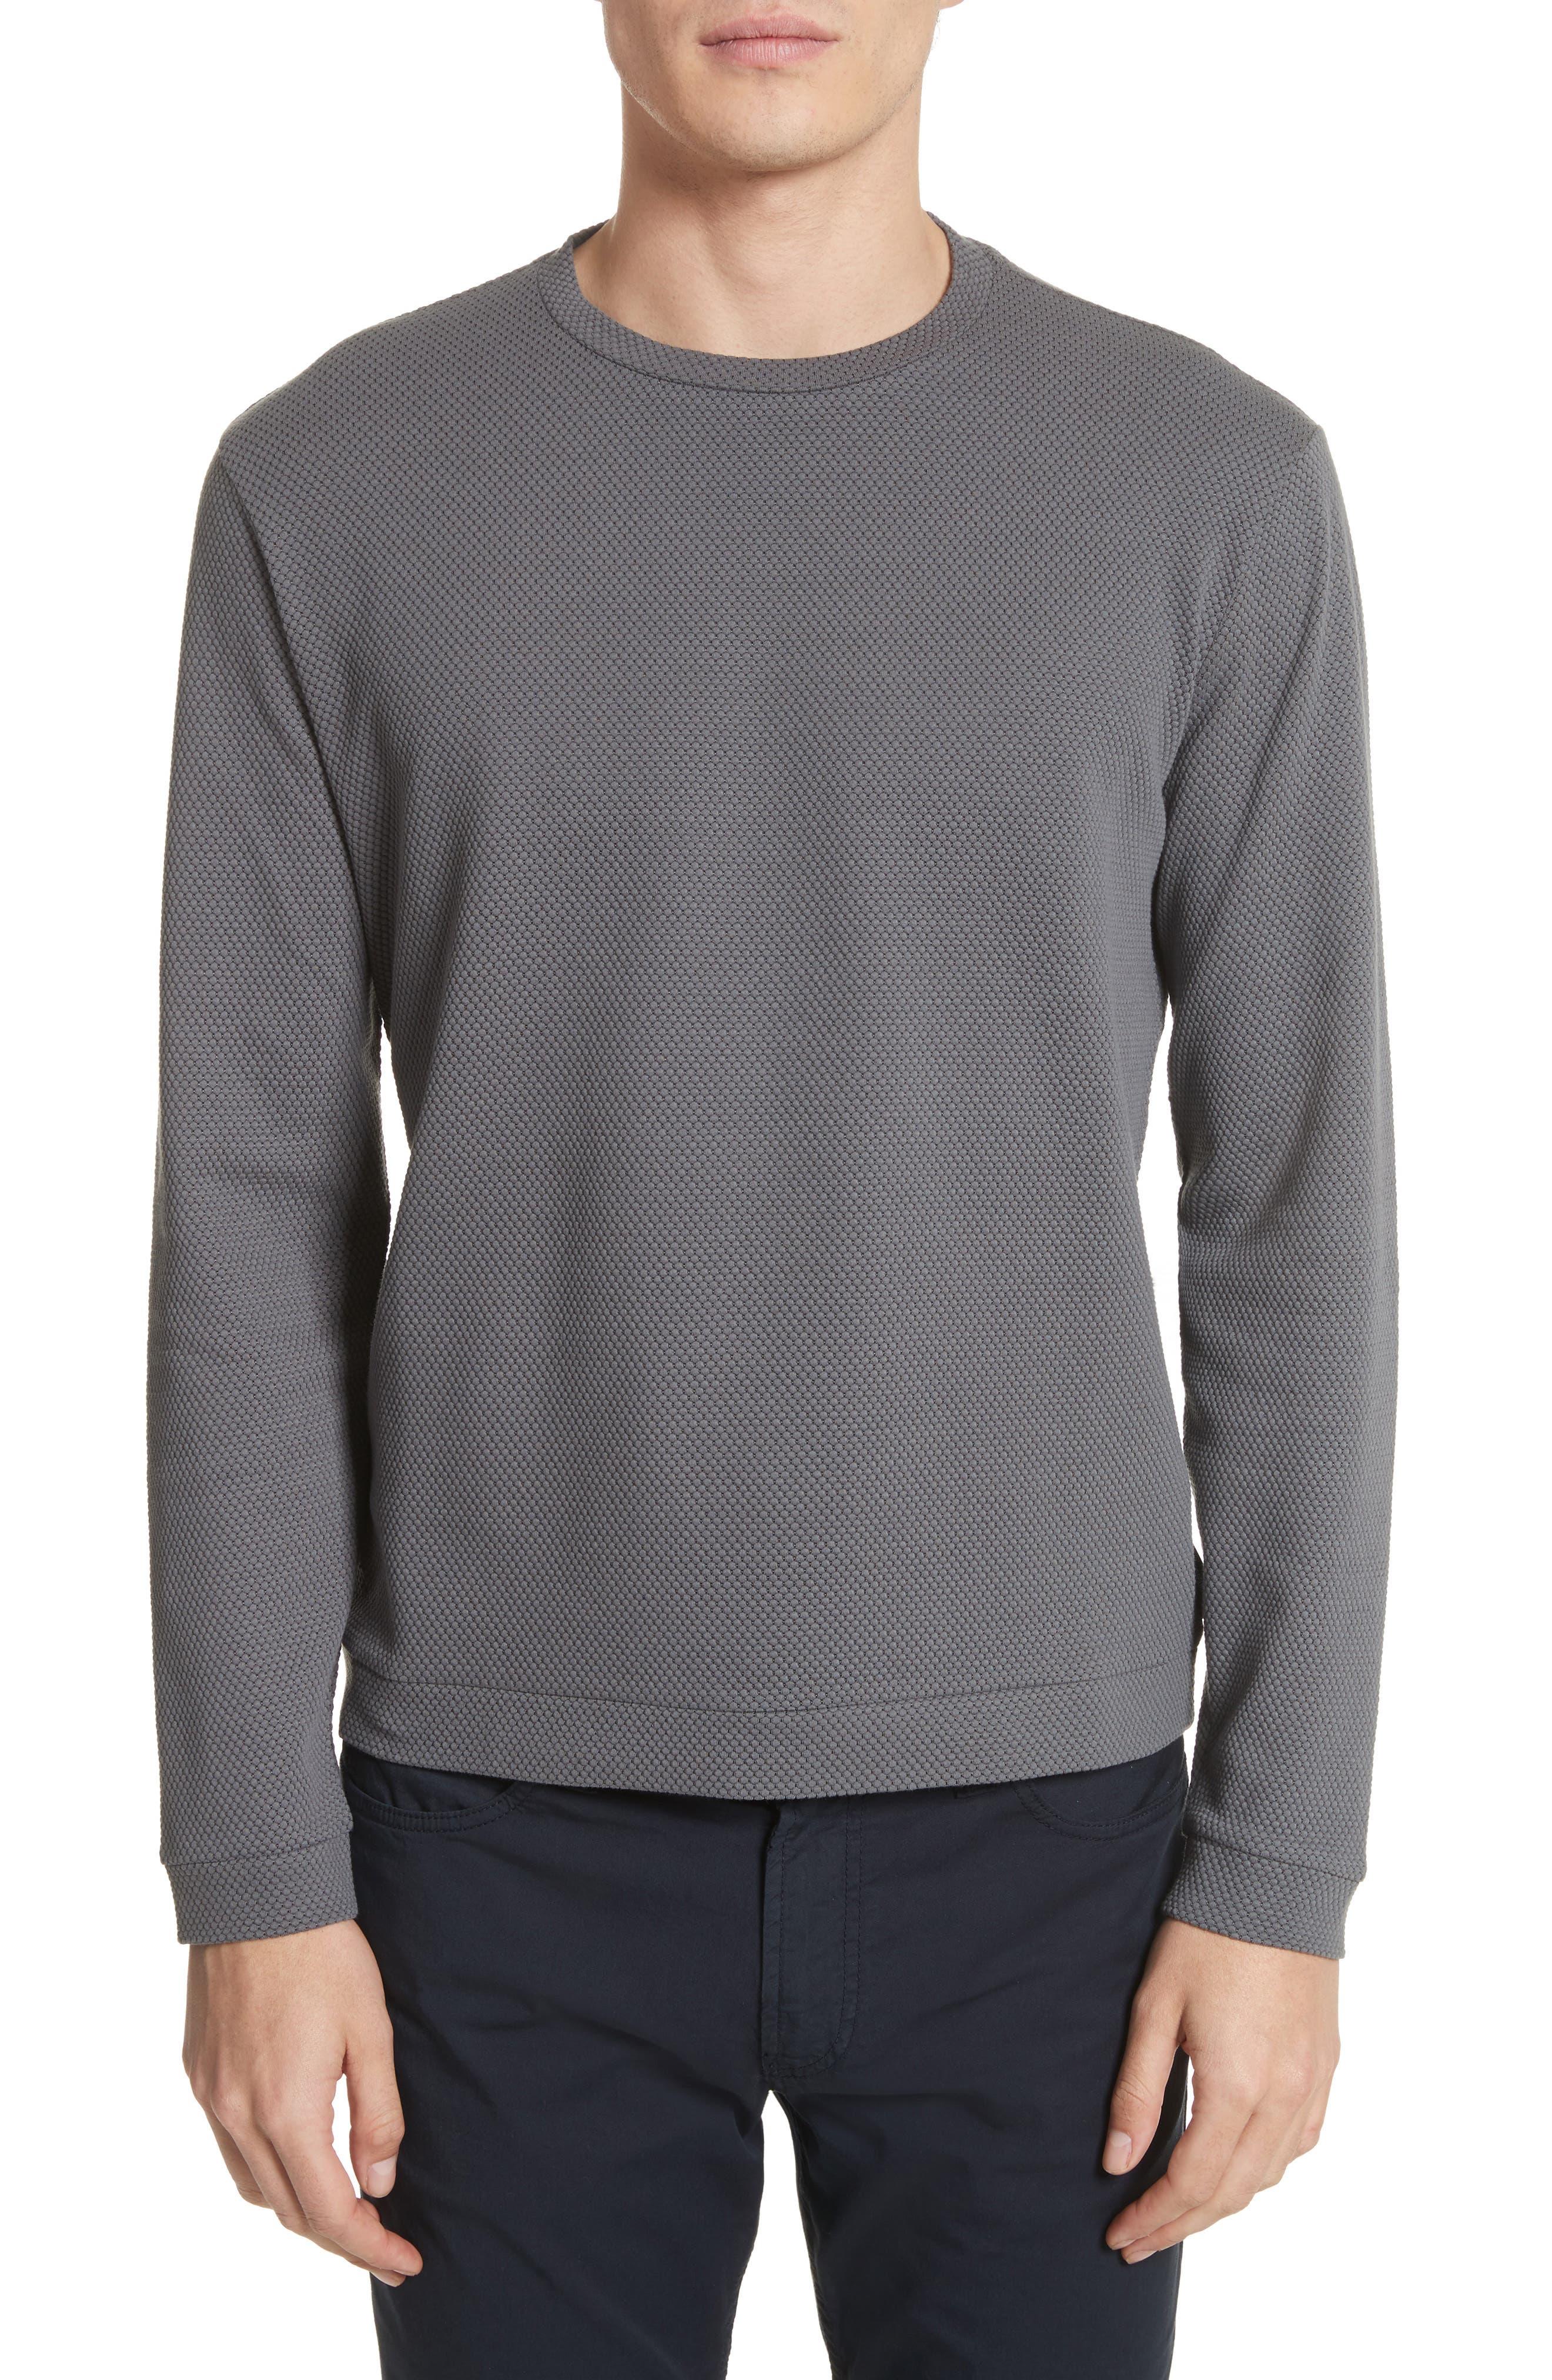 Alternate Image 1 Selected - Emporio Armani Honeycomb Jacquard Slim Fit T-Shirt